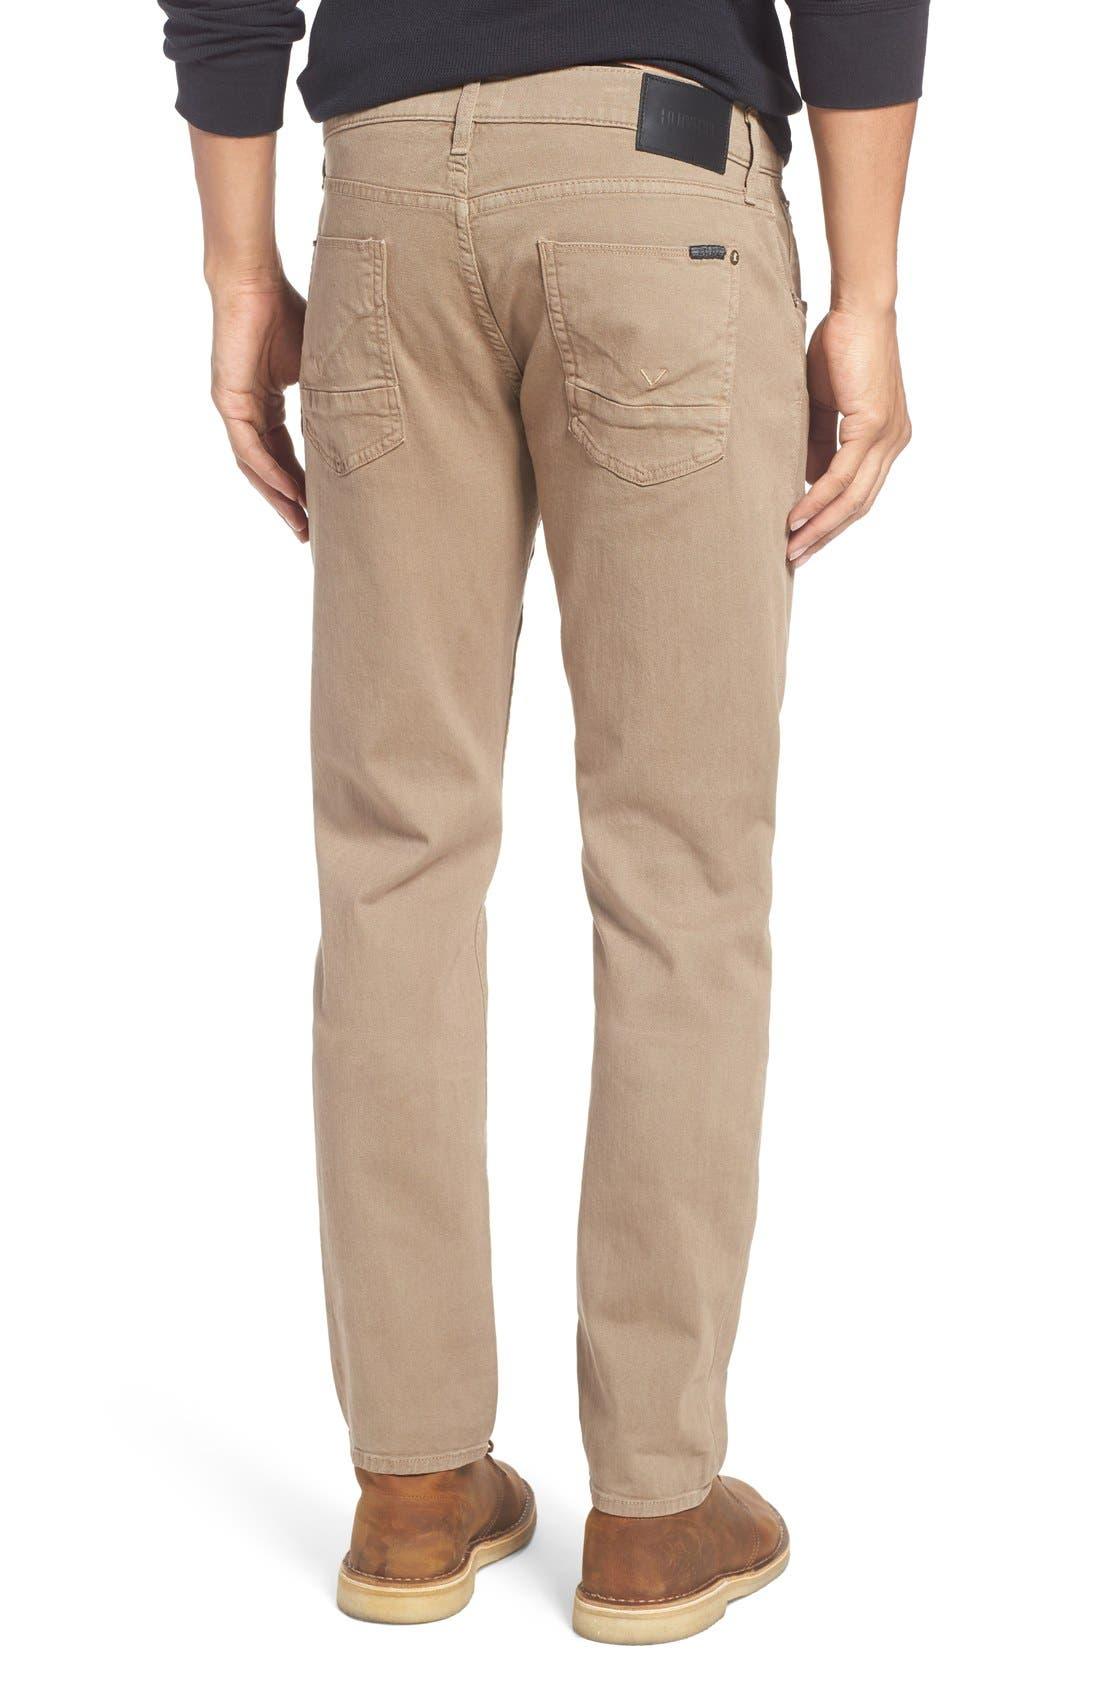 Alternate Image 2  - Hudson Jeans Blake Slim Fit Jeans (Quicksand Khaki)